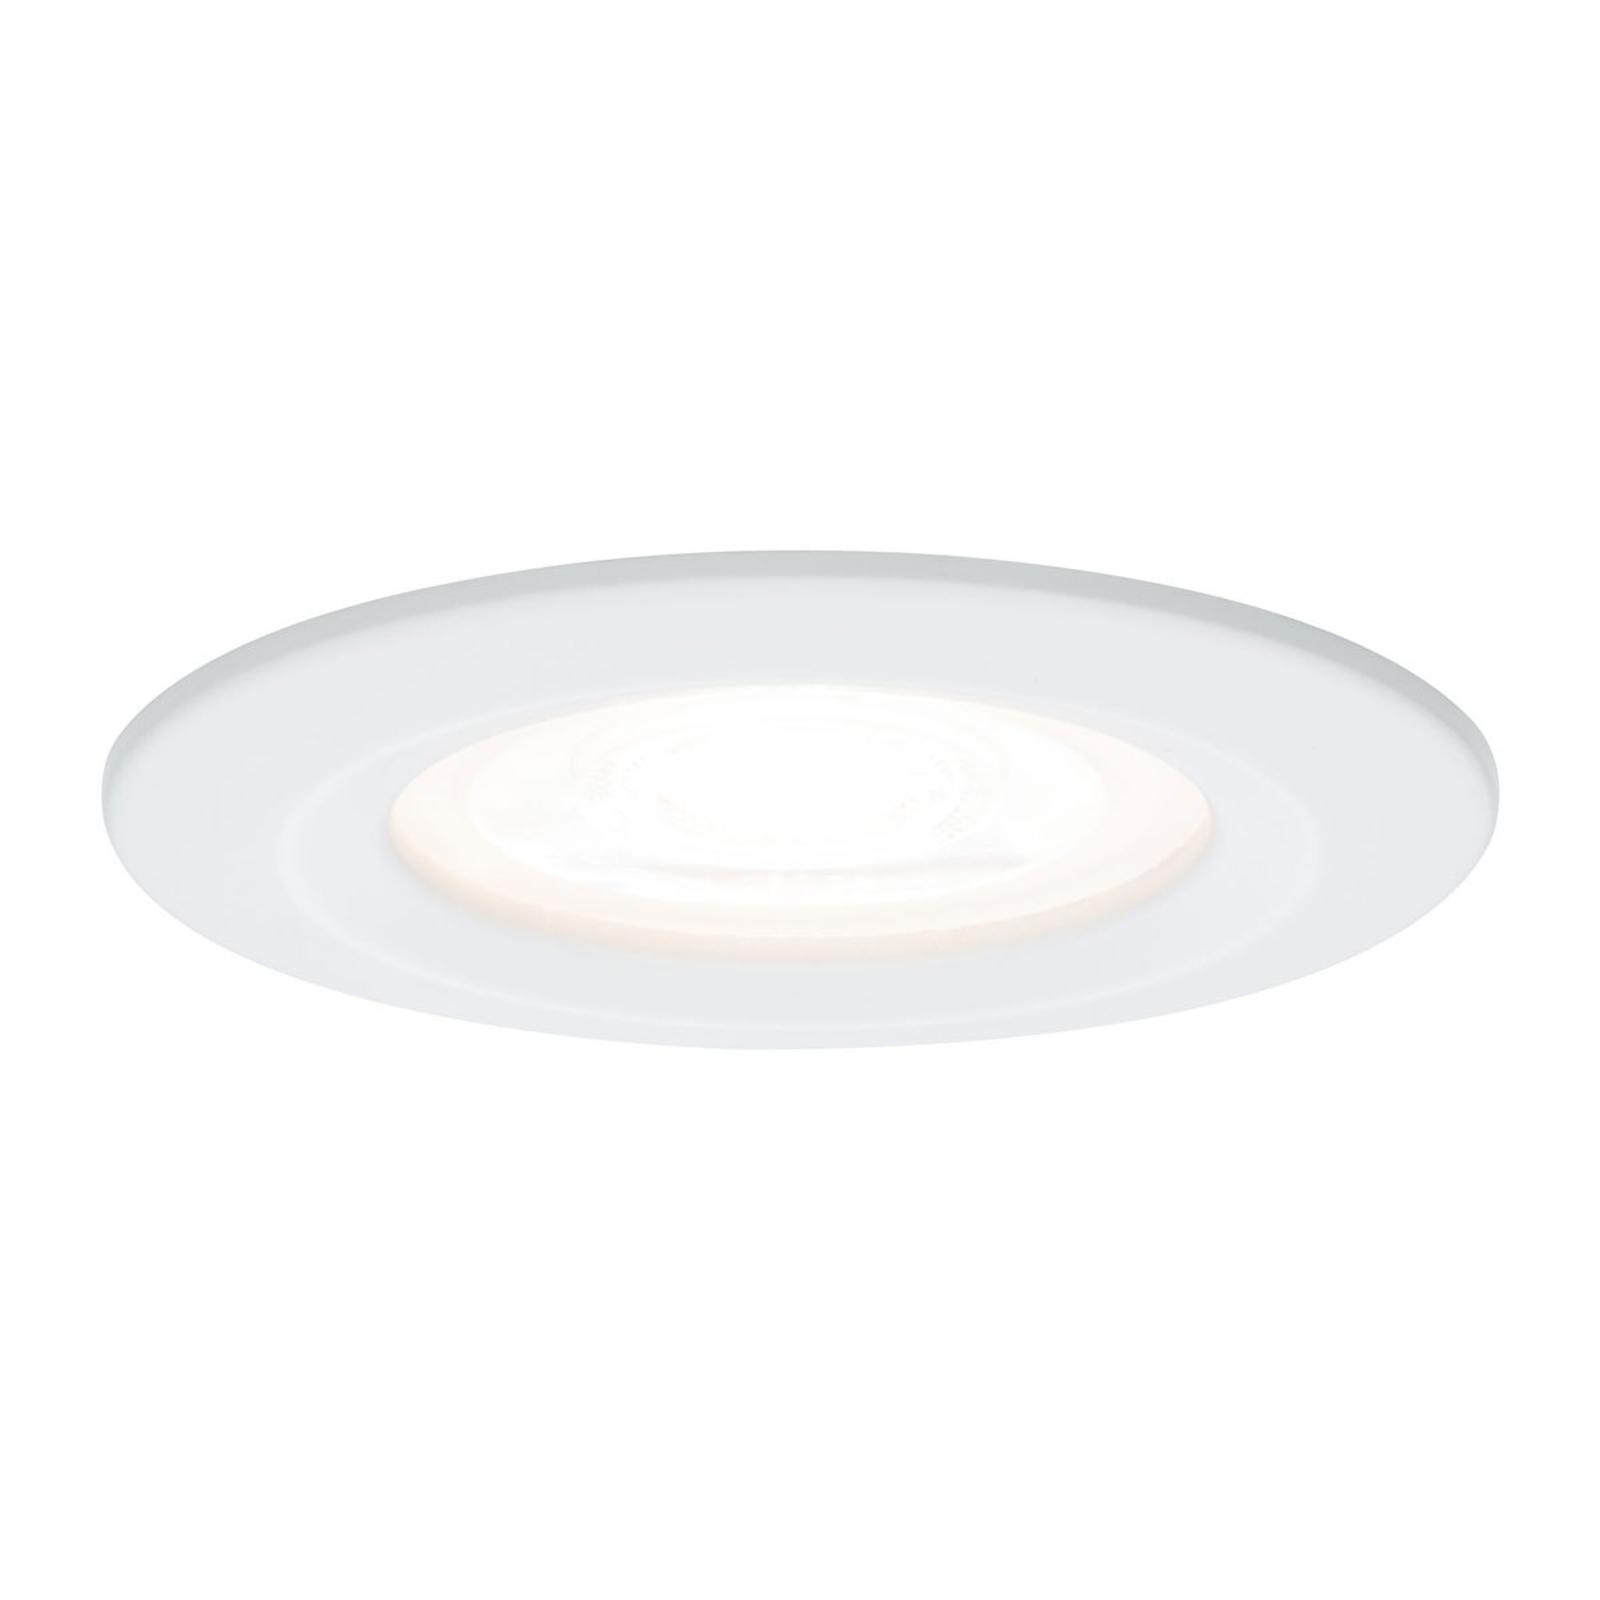 Paulmann LED-spot Nova rund, IP44, dimbar, vit